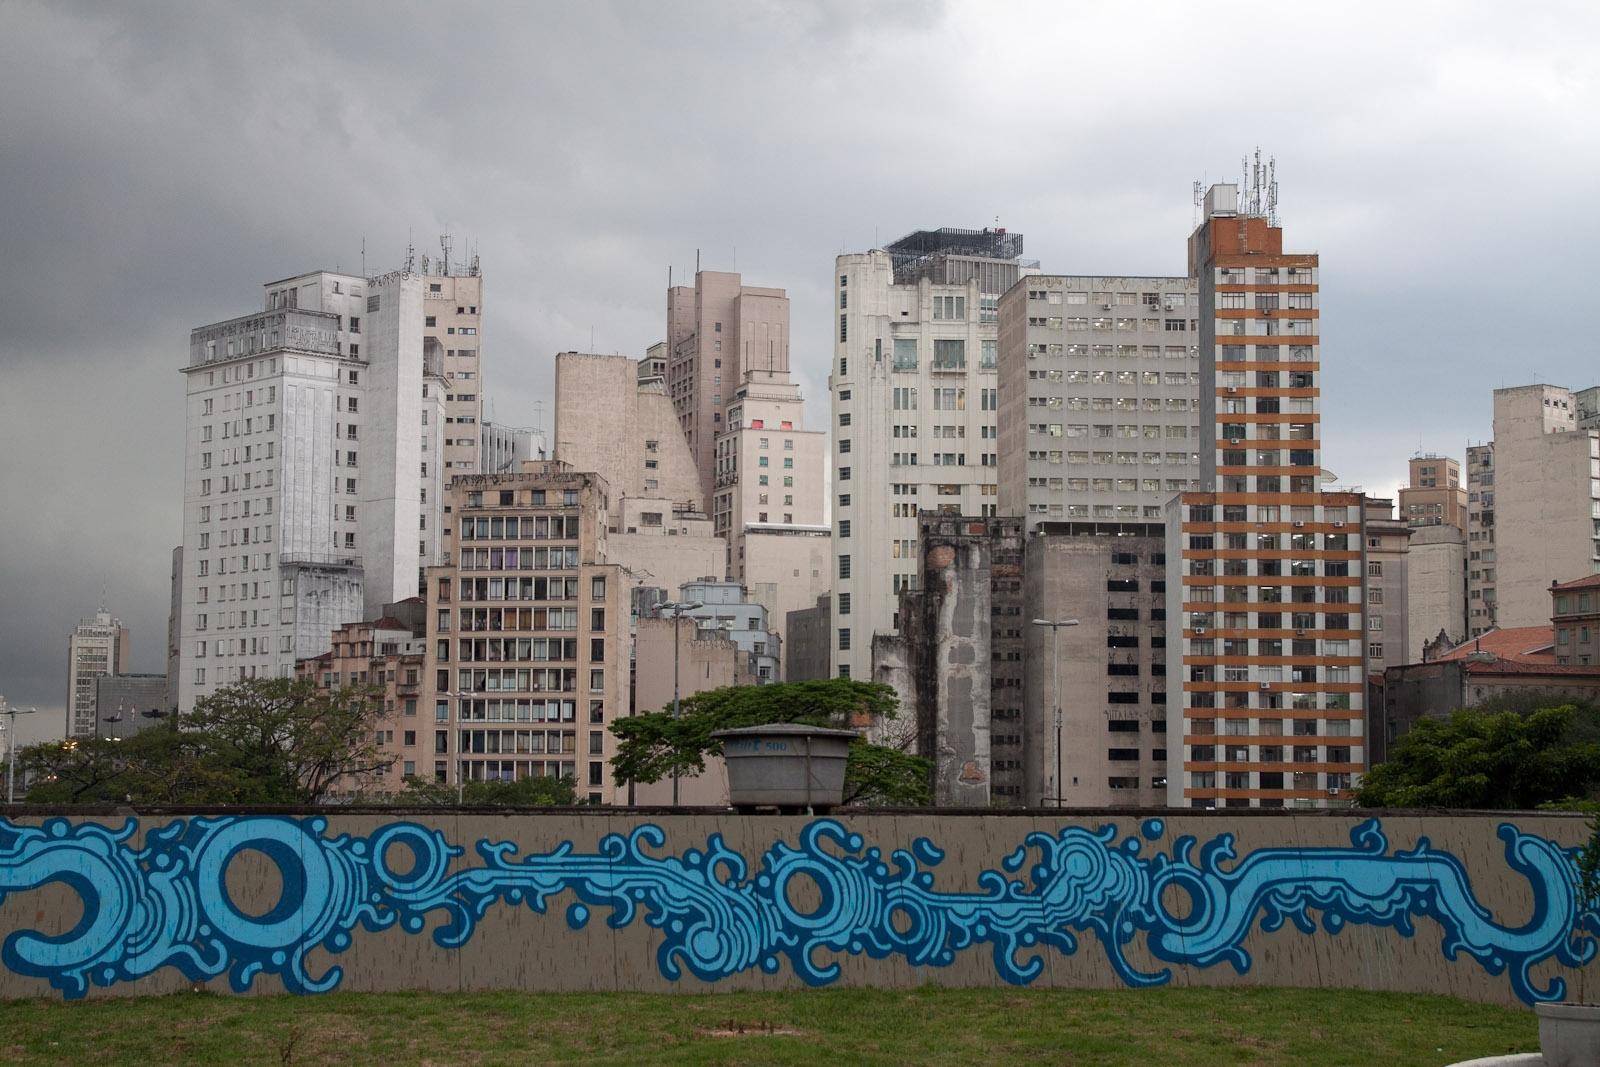 Centro / Downtown